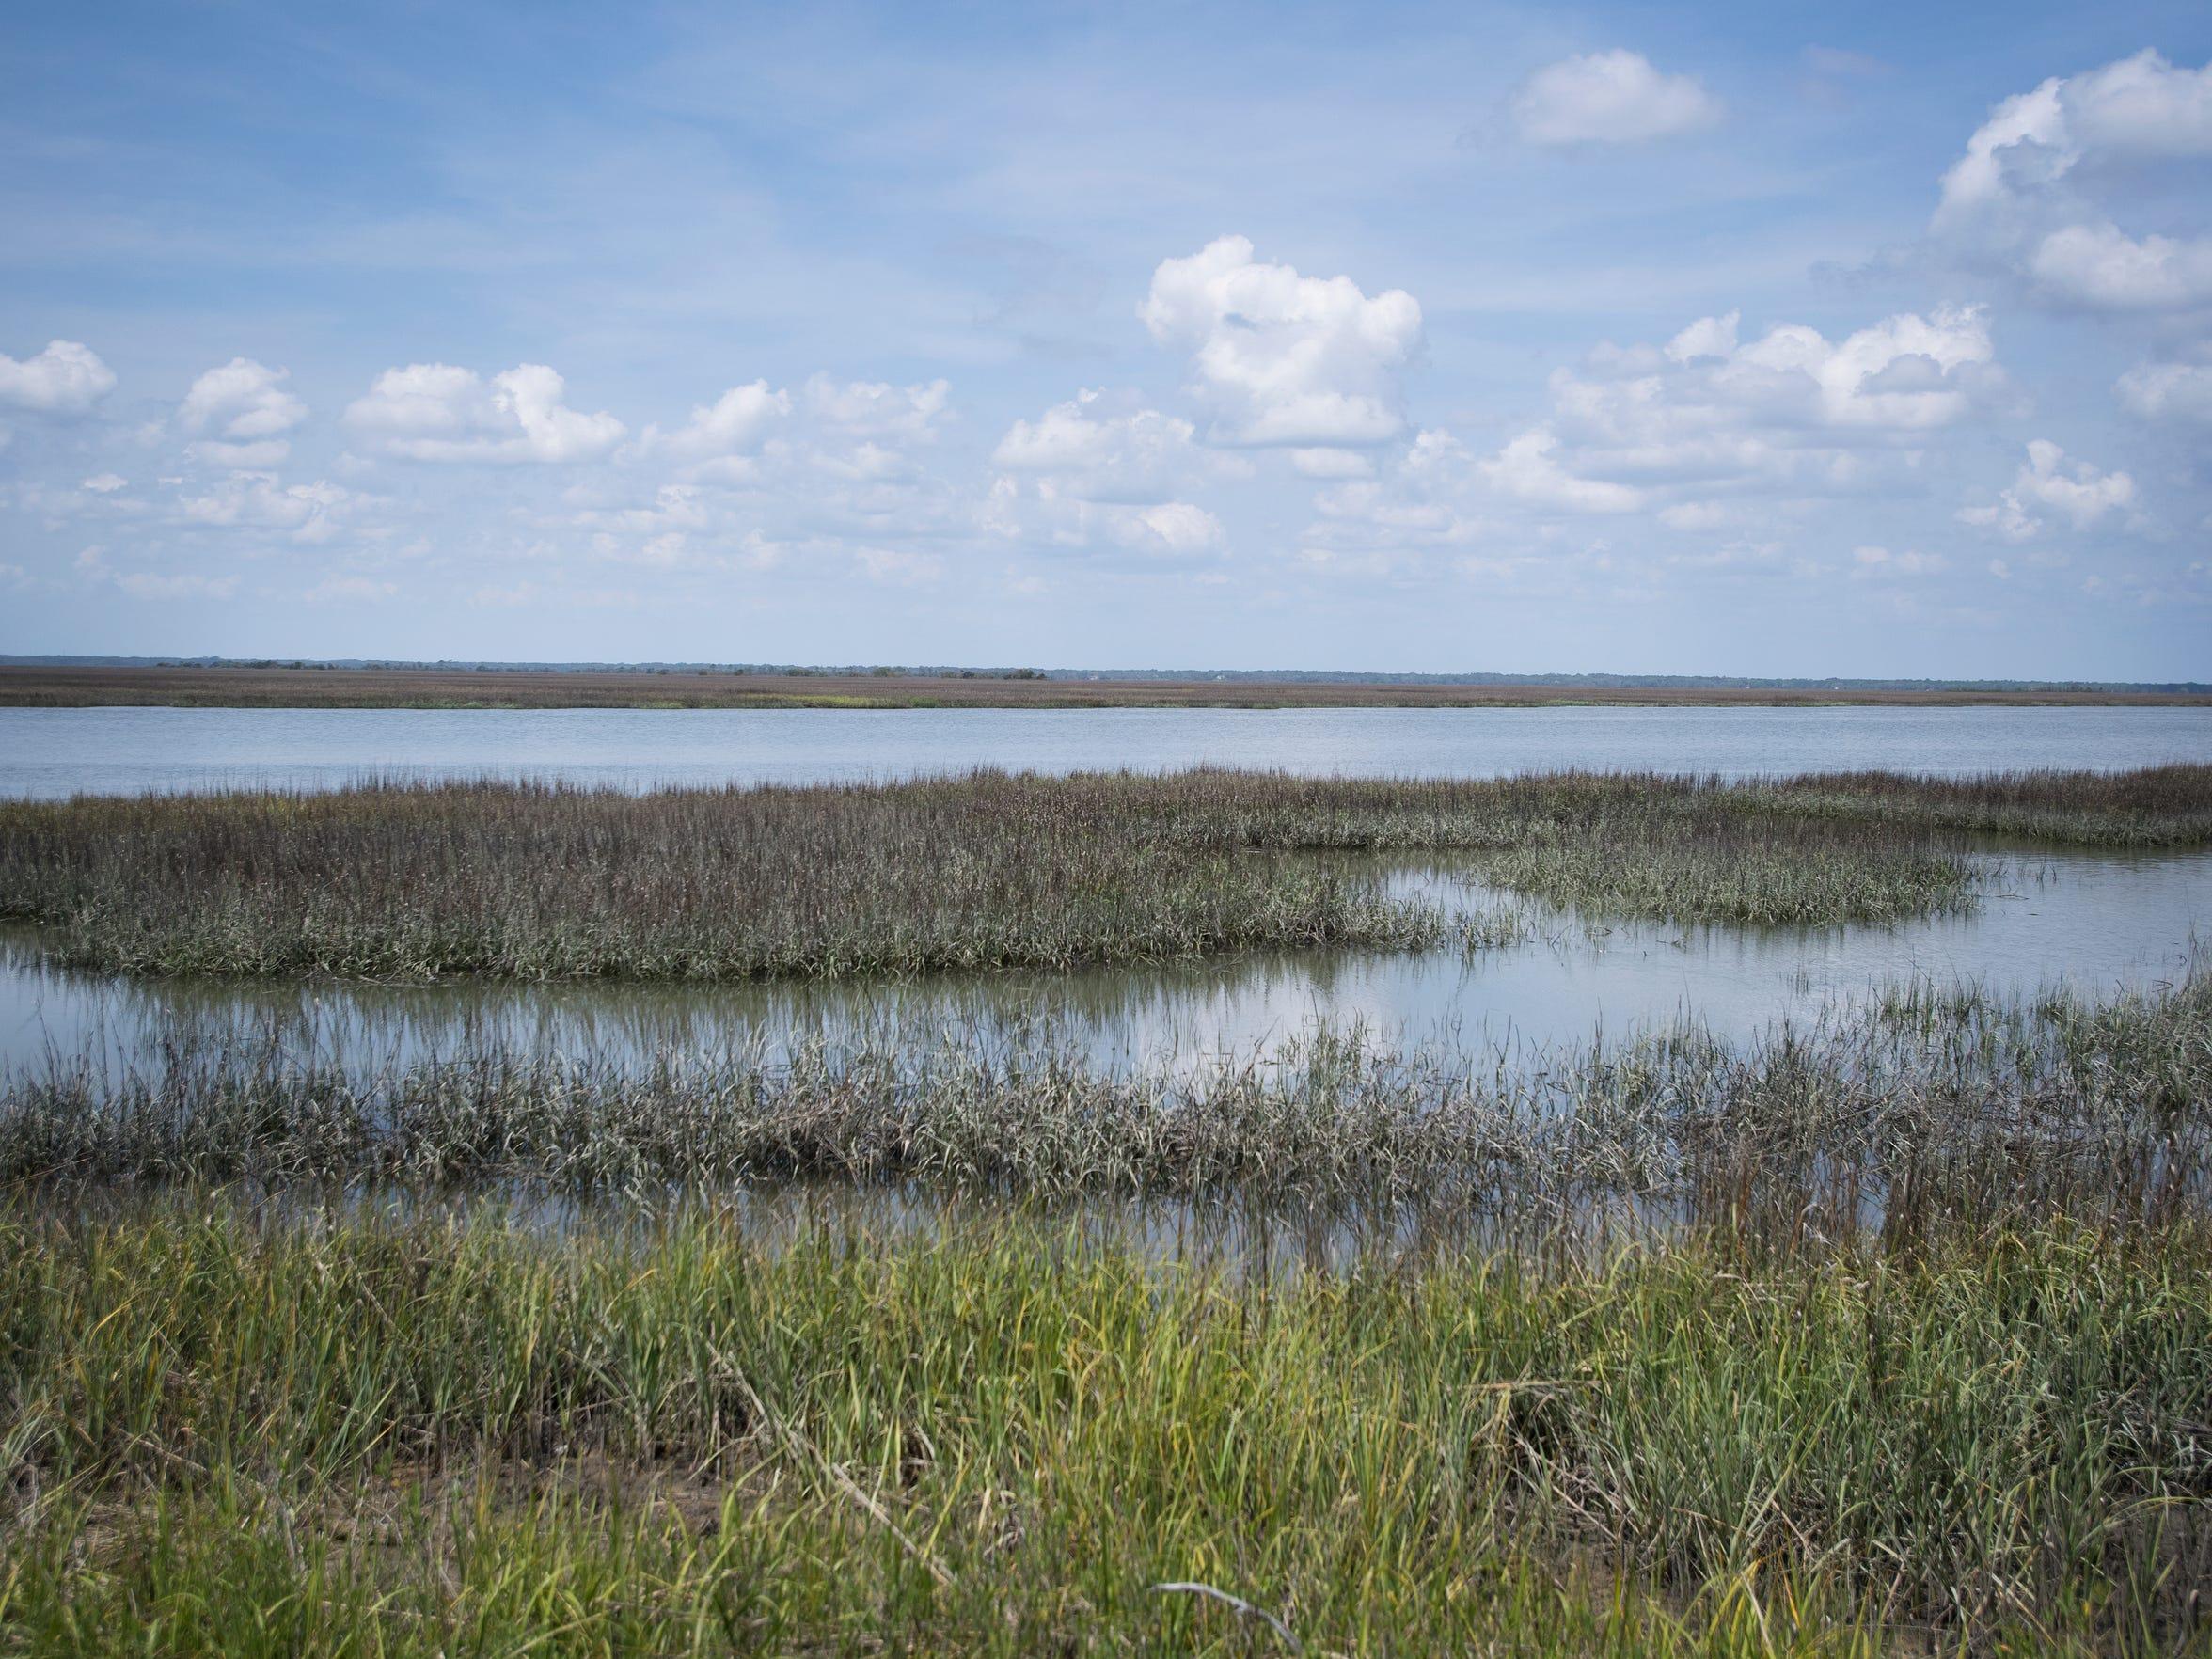 An area of marsh near St. Helena Island on Saturday, April 15, 2017.